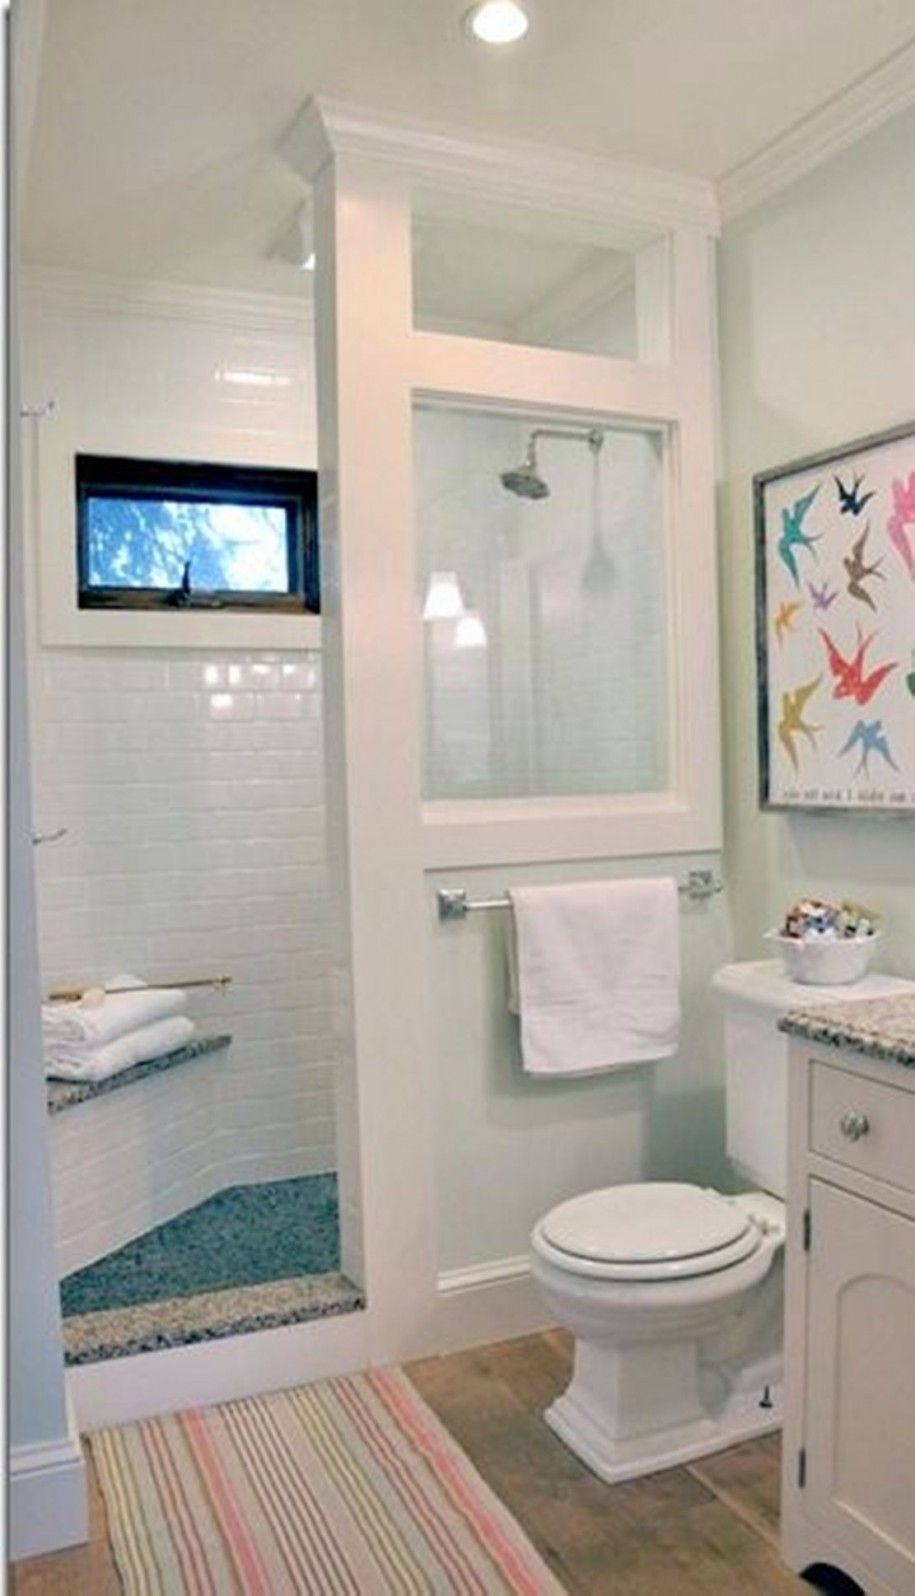 Modern Walk In Shower Ideas Bathroom Awesome Small Bathroom Design Ideas With Walk In Shower Good House Bathroom Bathroom Shower Design Bathrooms Remodel